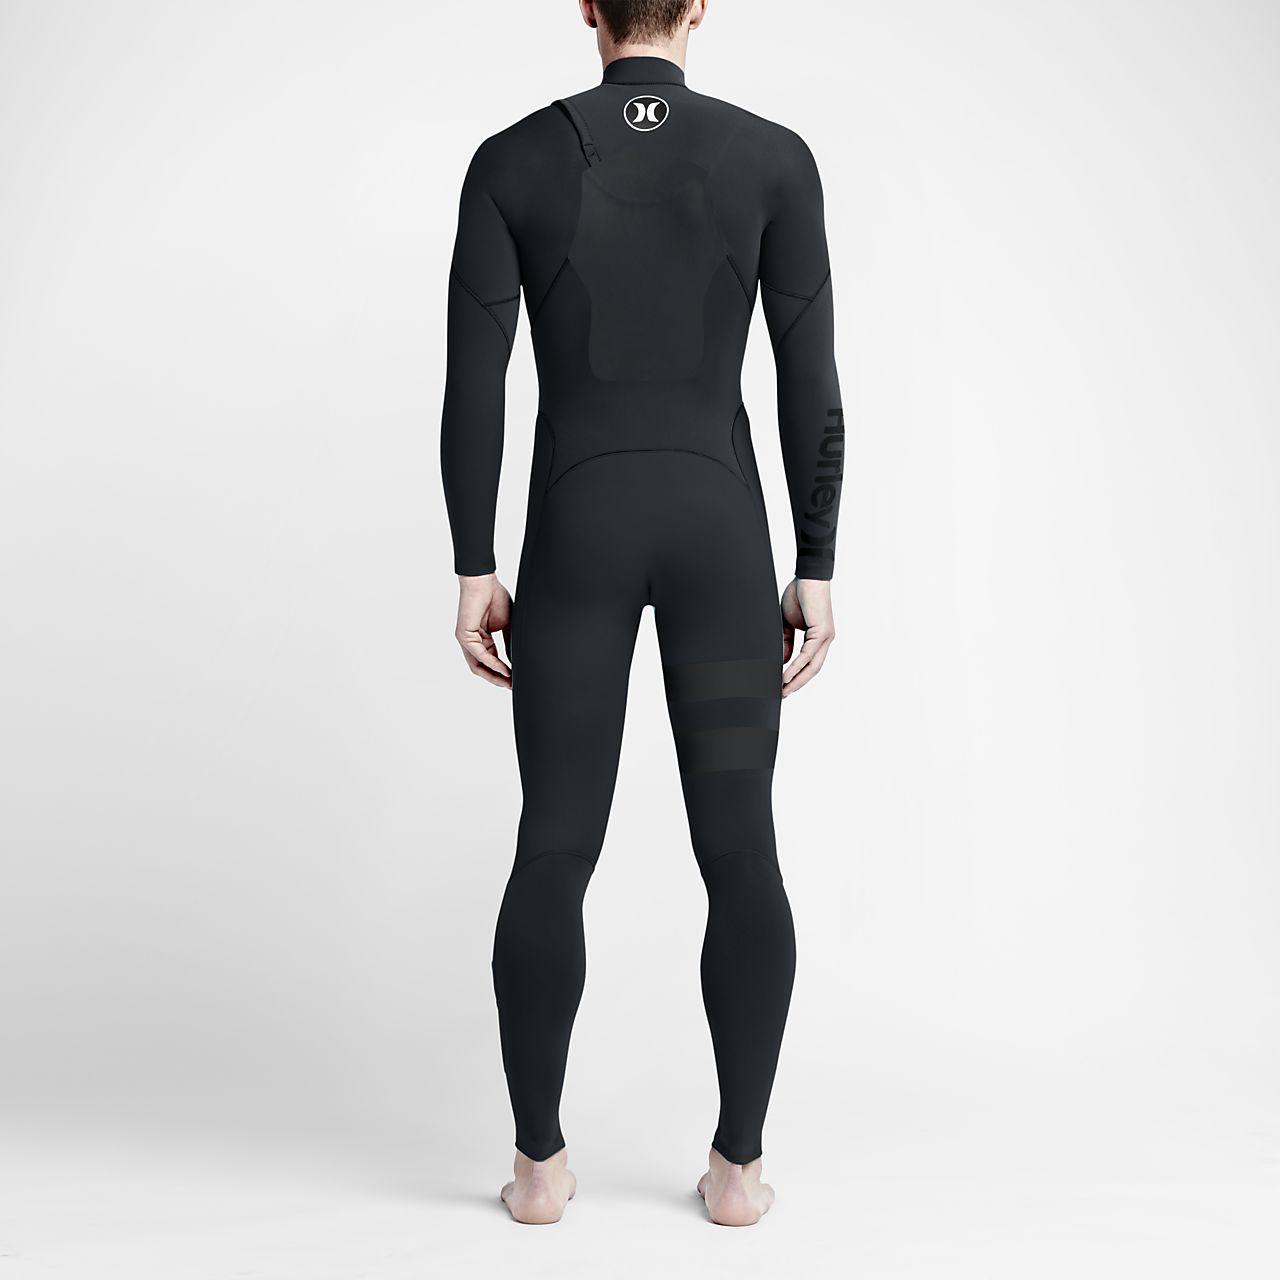 ... Hurley Fusion 403 Fullsuit Men's Wetsuit